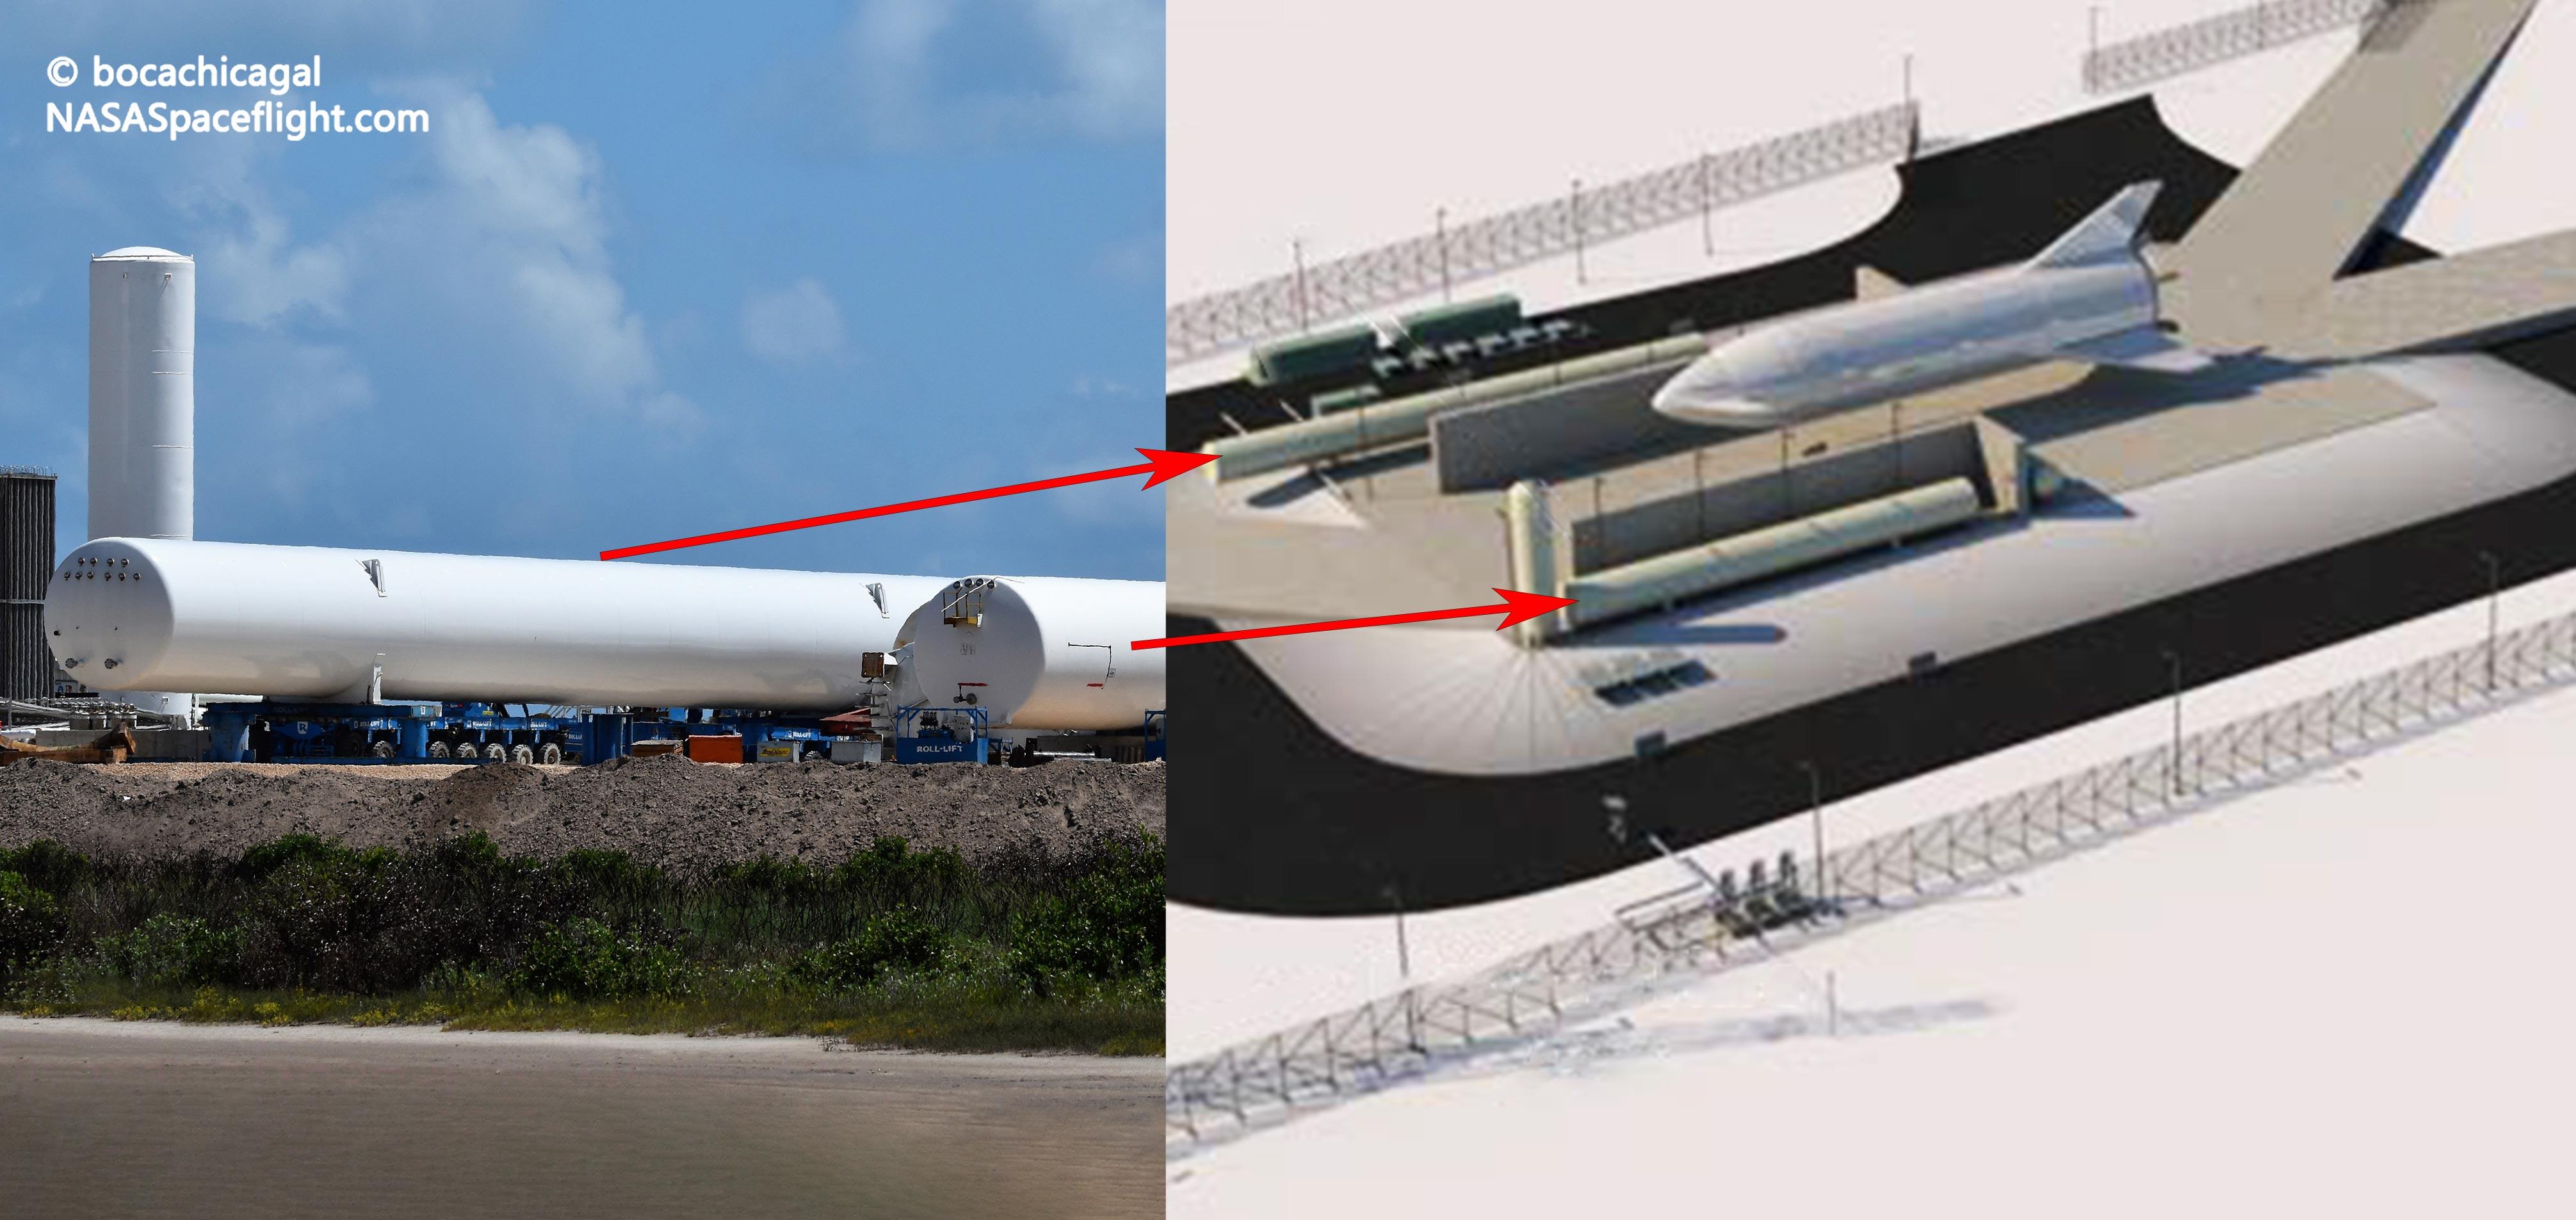 Boca Chica Starship Mk1 092219 (NASASpaceflight – bocachicagal) pad new tanks 1 edit (c)